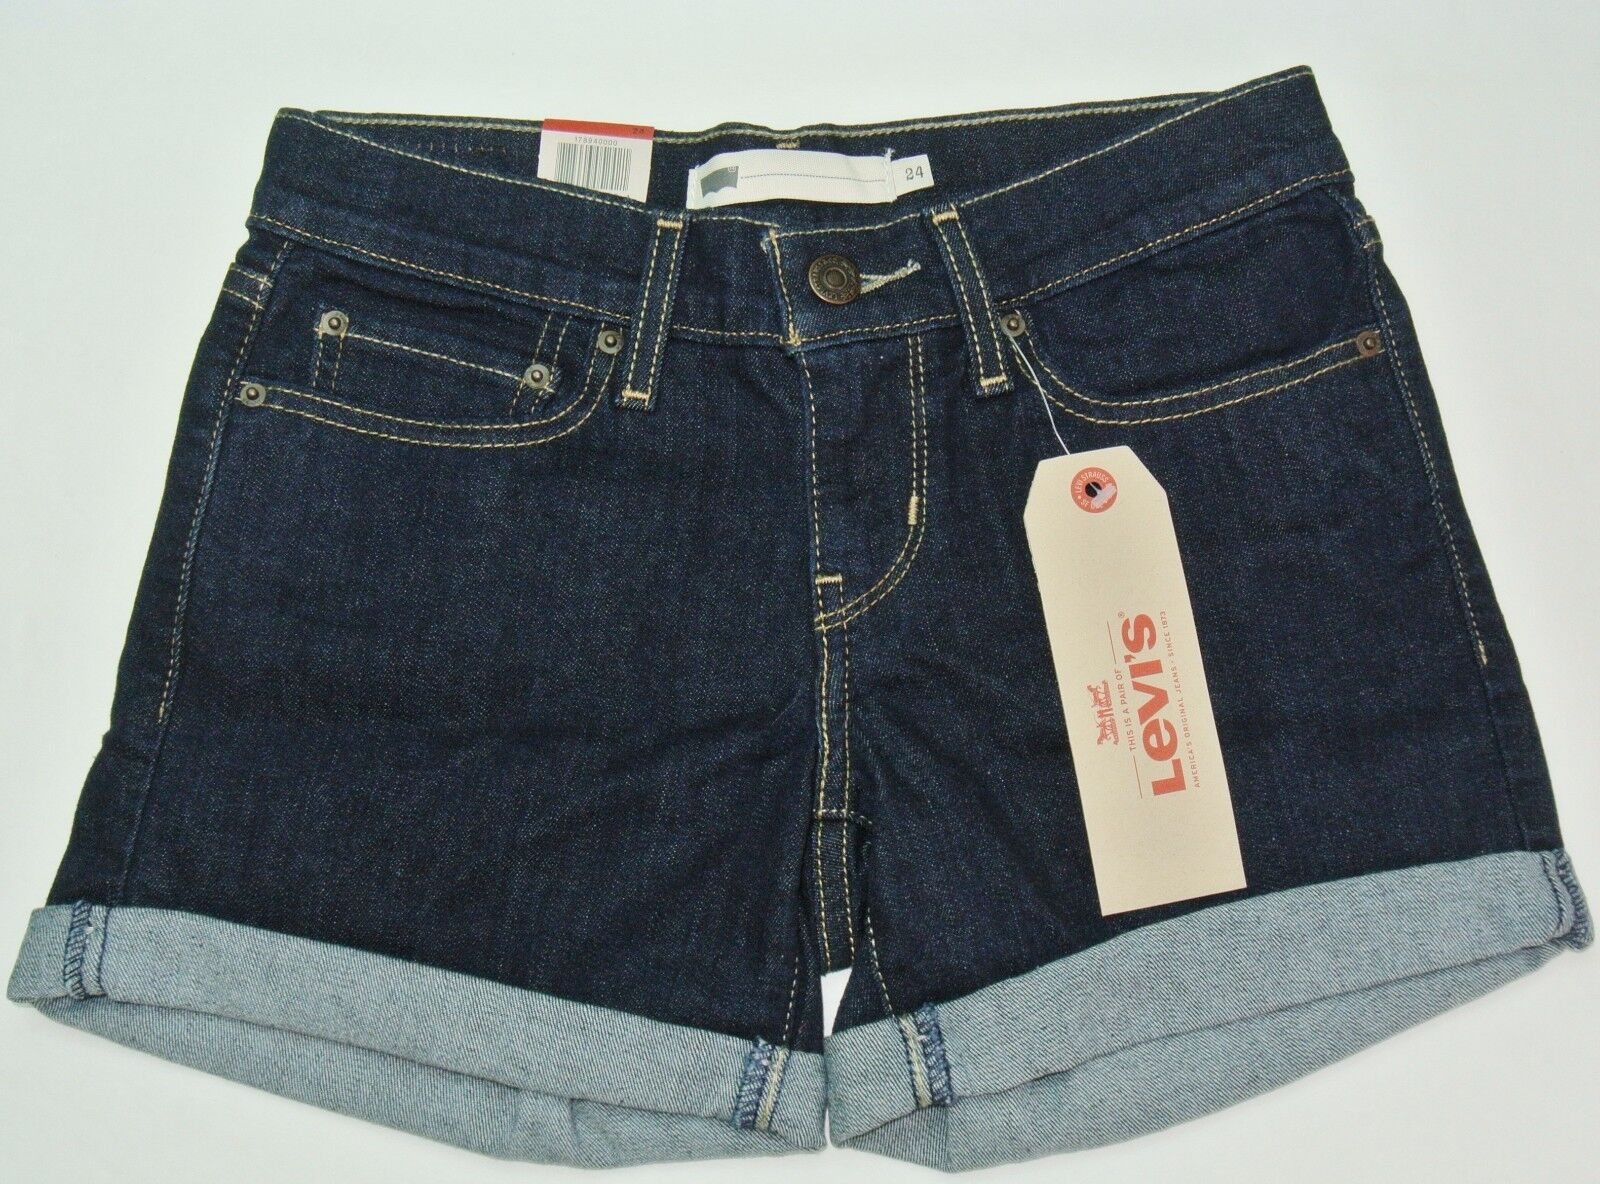 Levi's Women's Shorts 24 Blue Dark Wash Short Jeans Mid